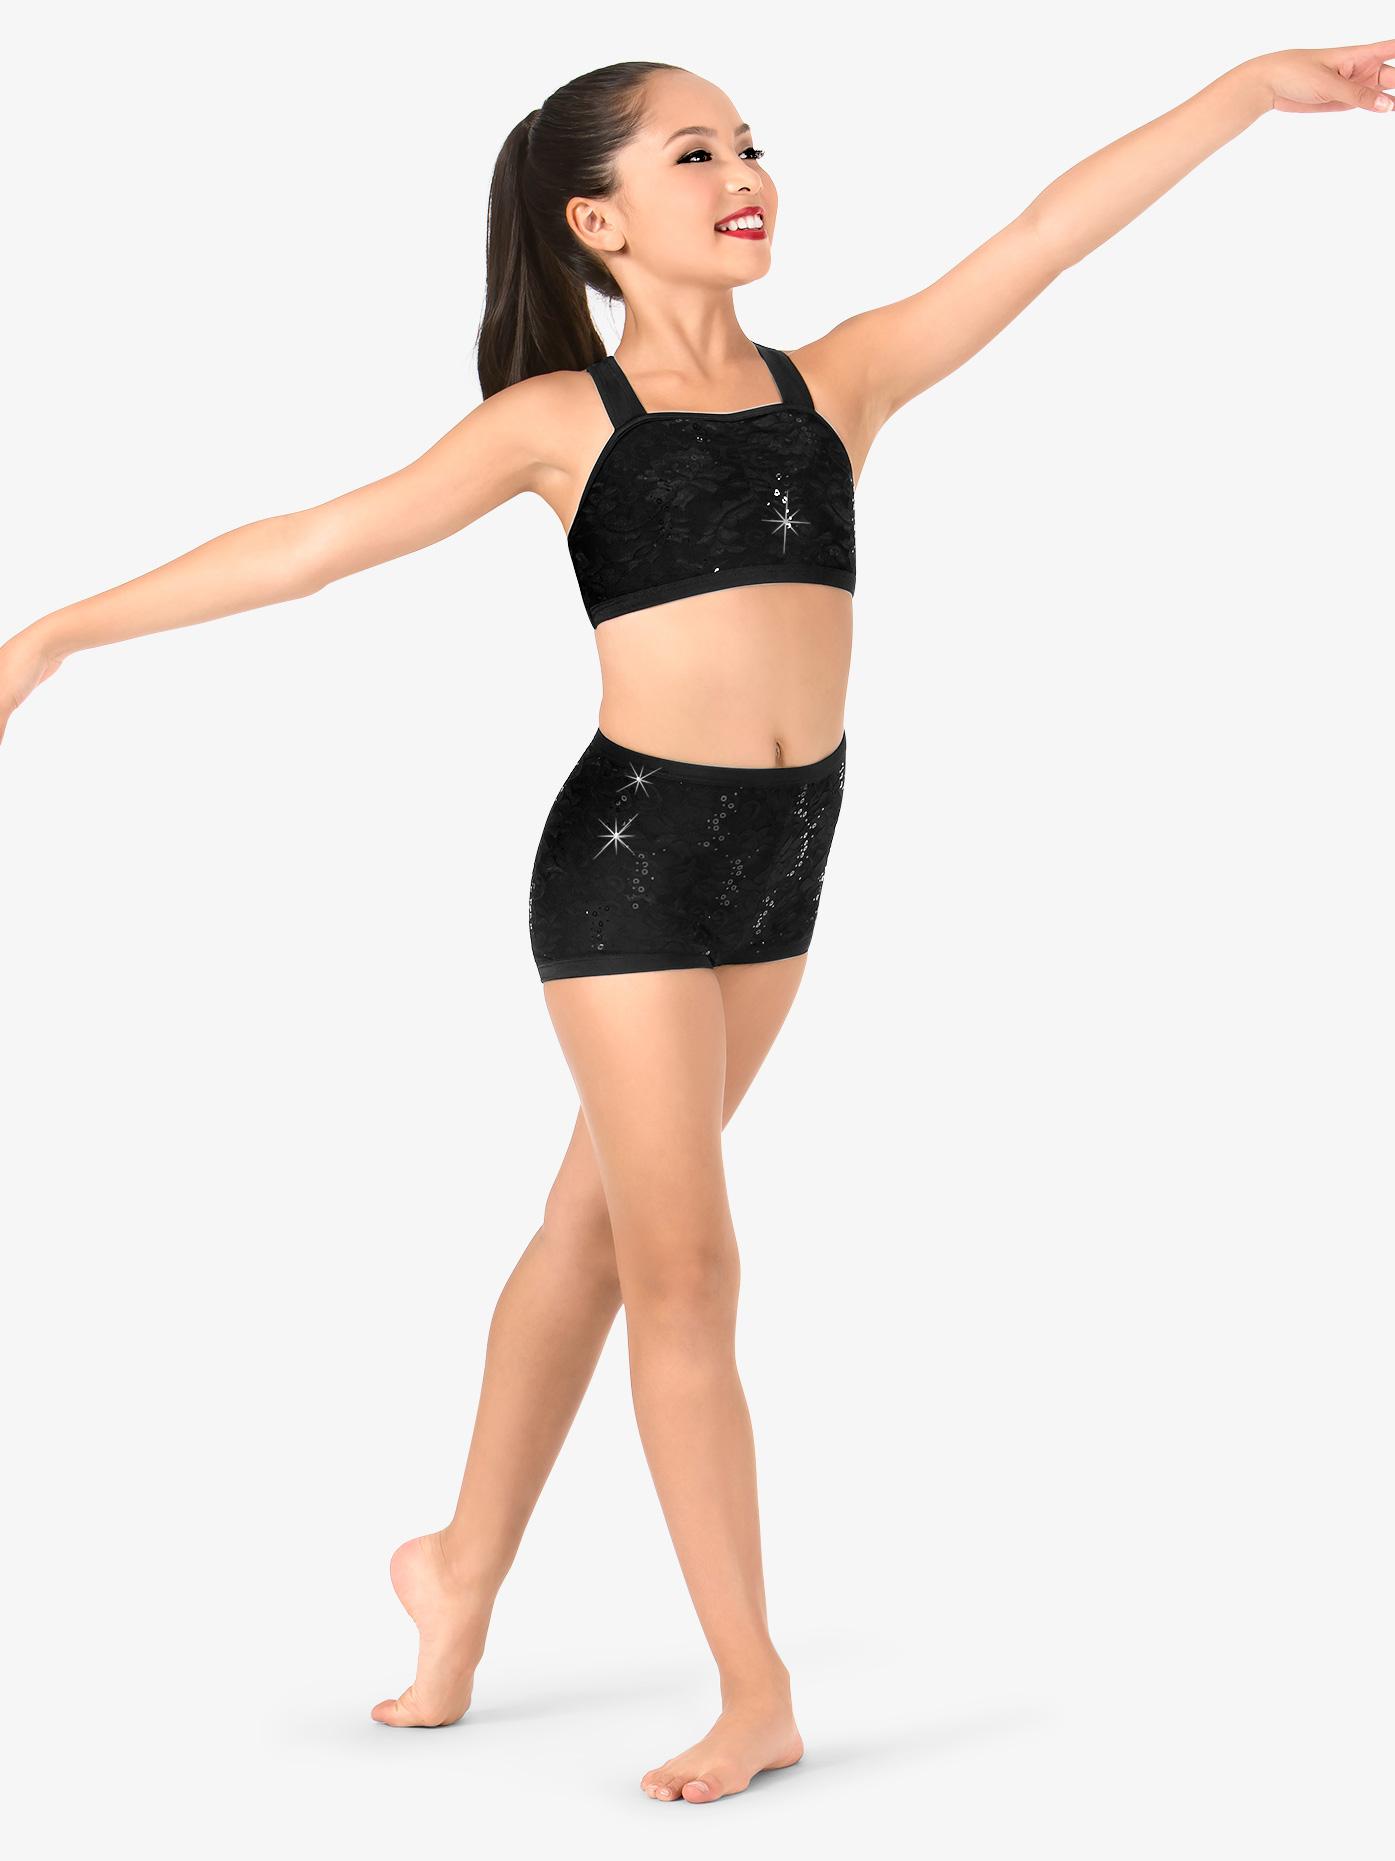 Elisse by Double Platinum Girls Floral Lace Dance Shorts N7497C